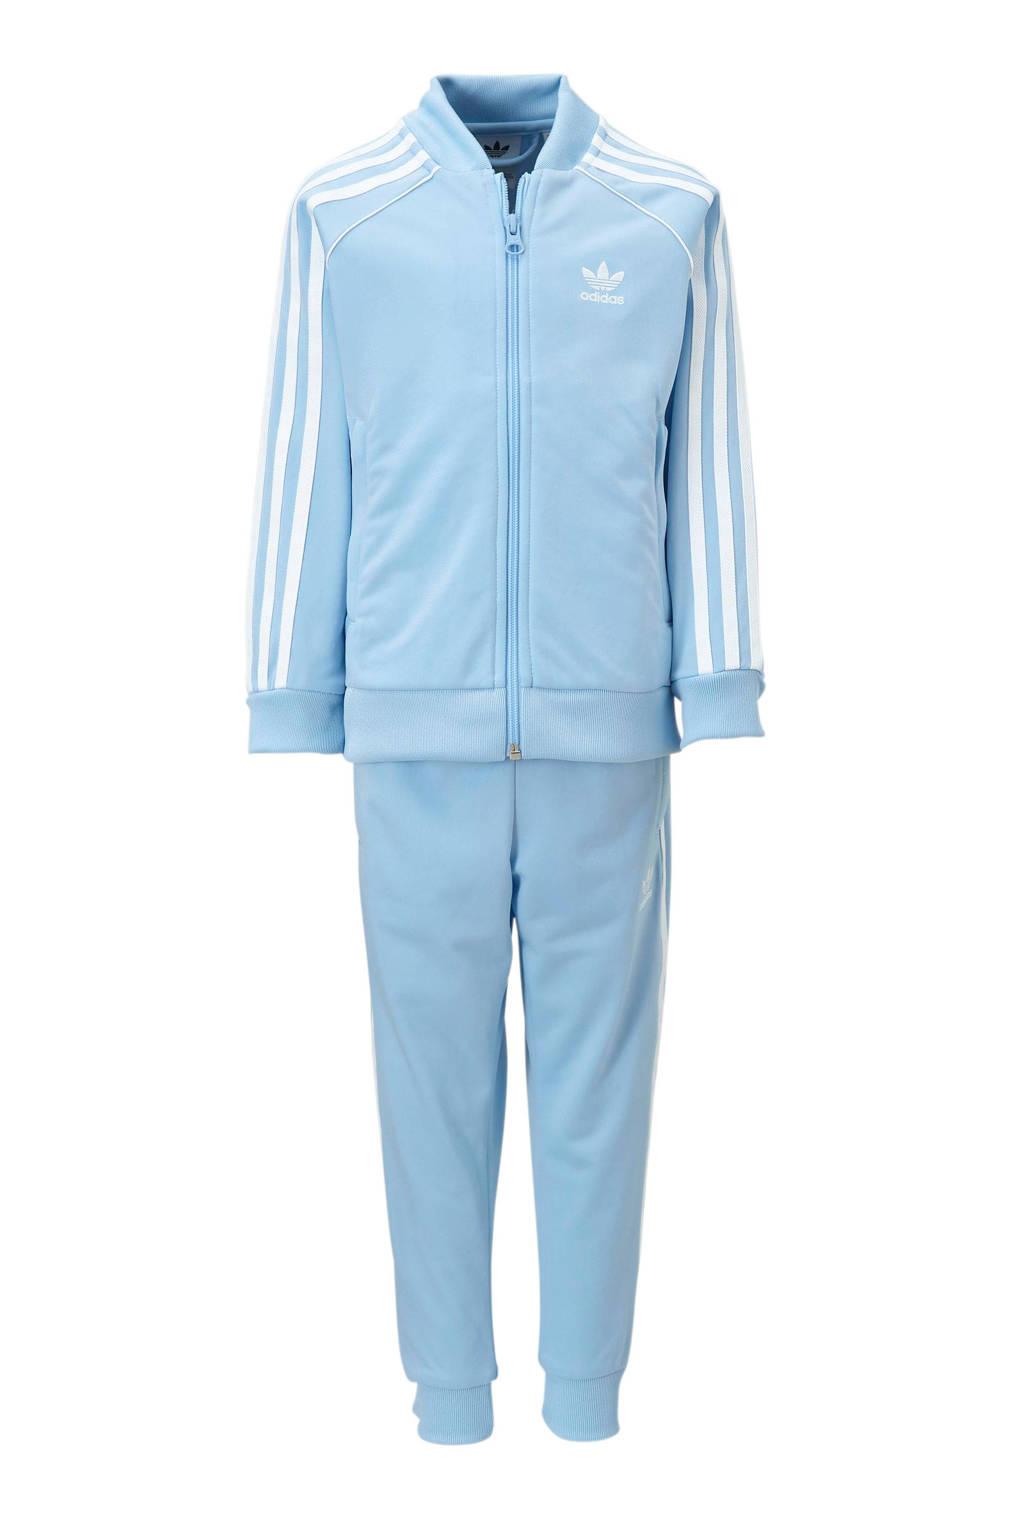 adidas originals   trainingspak lichtblauw, Lichtblauw